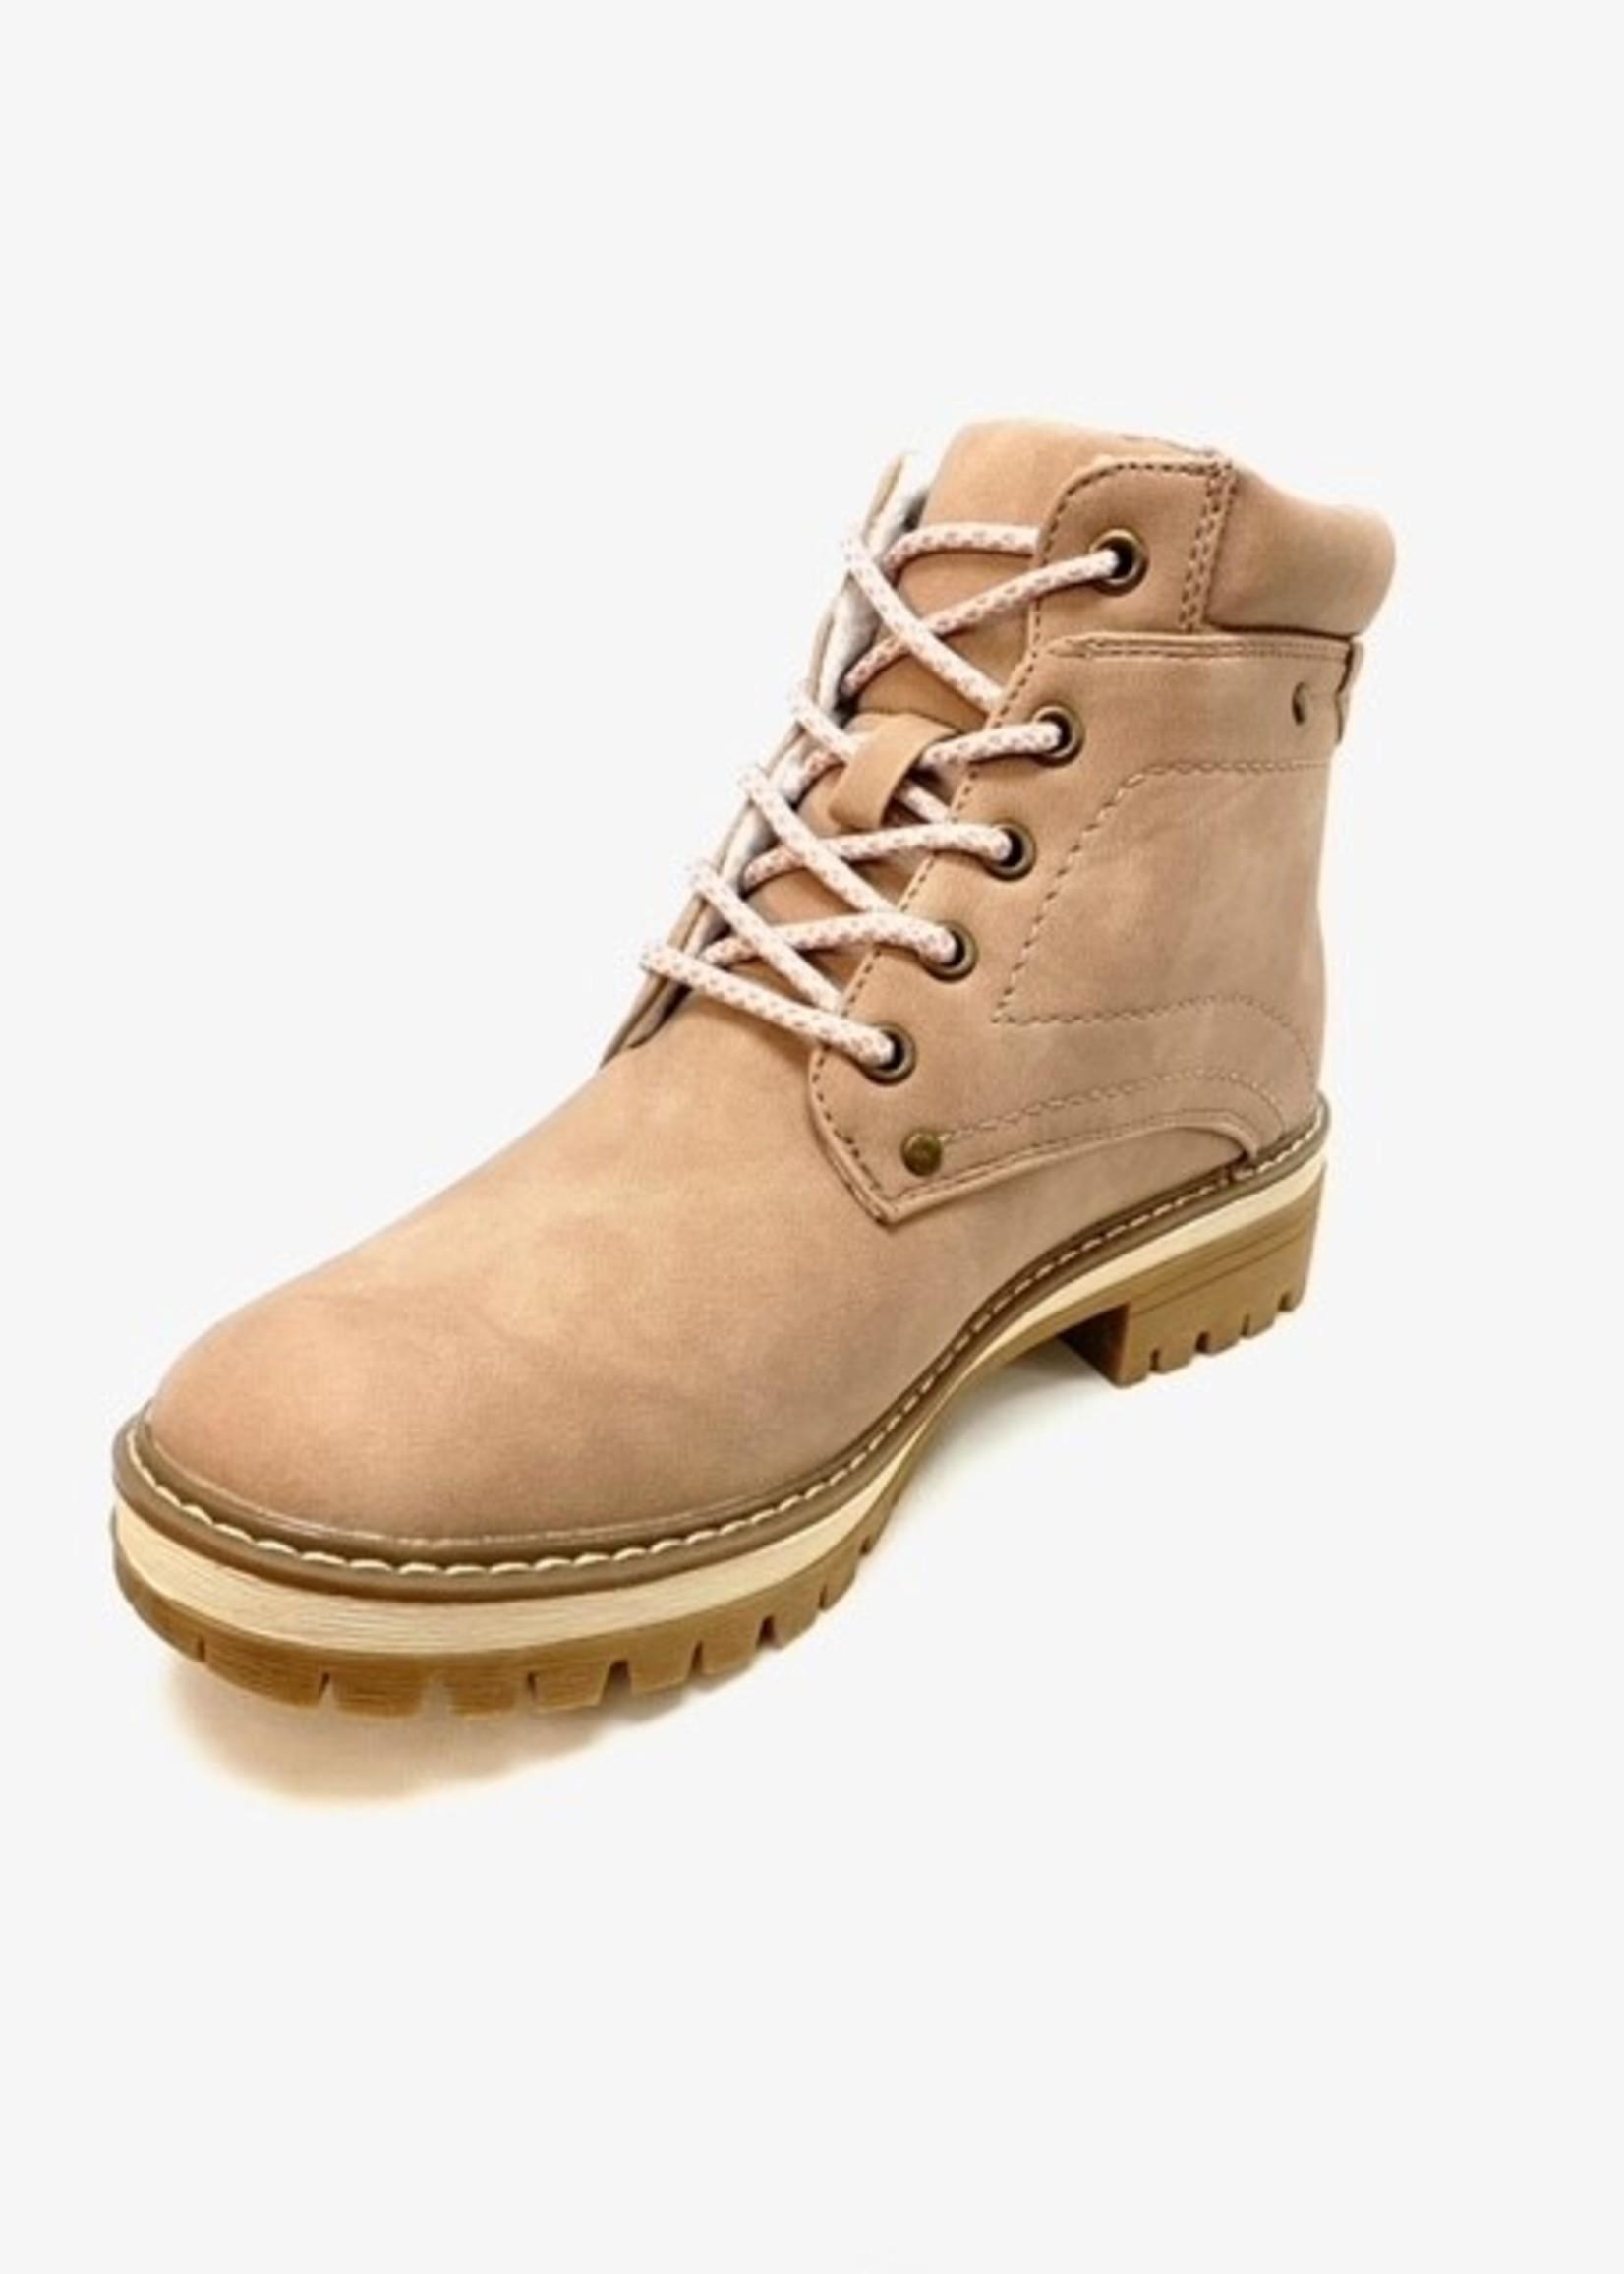 Frontier North short boot